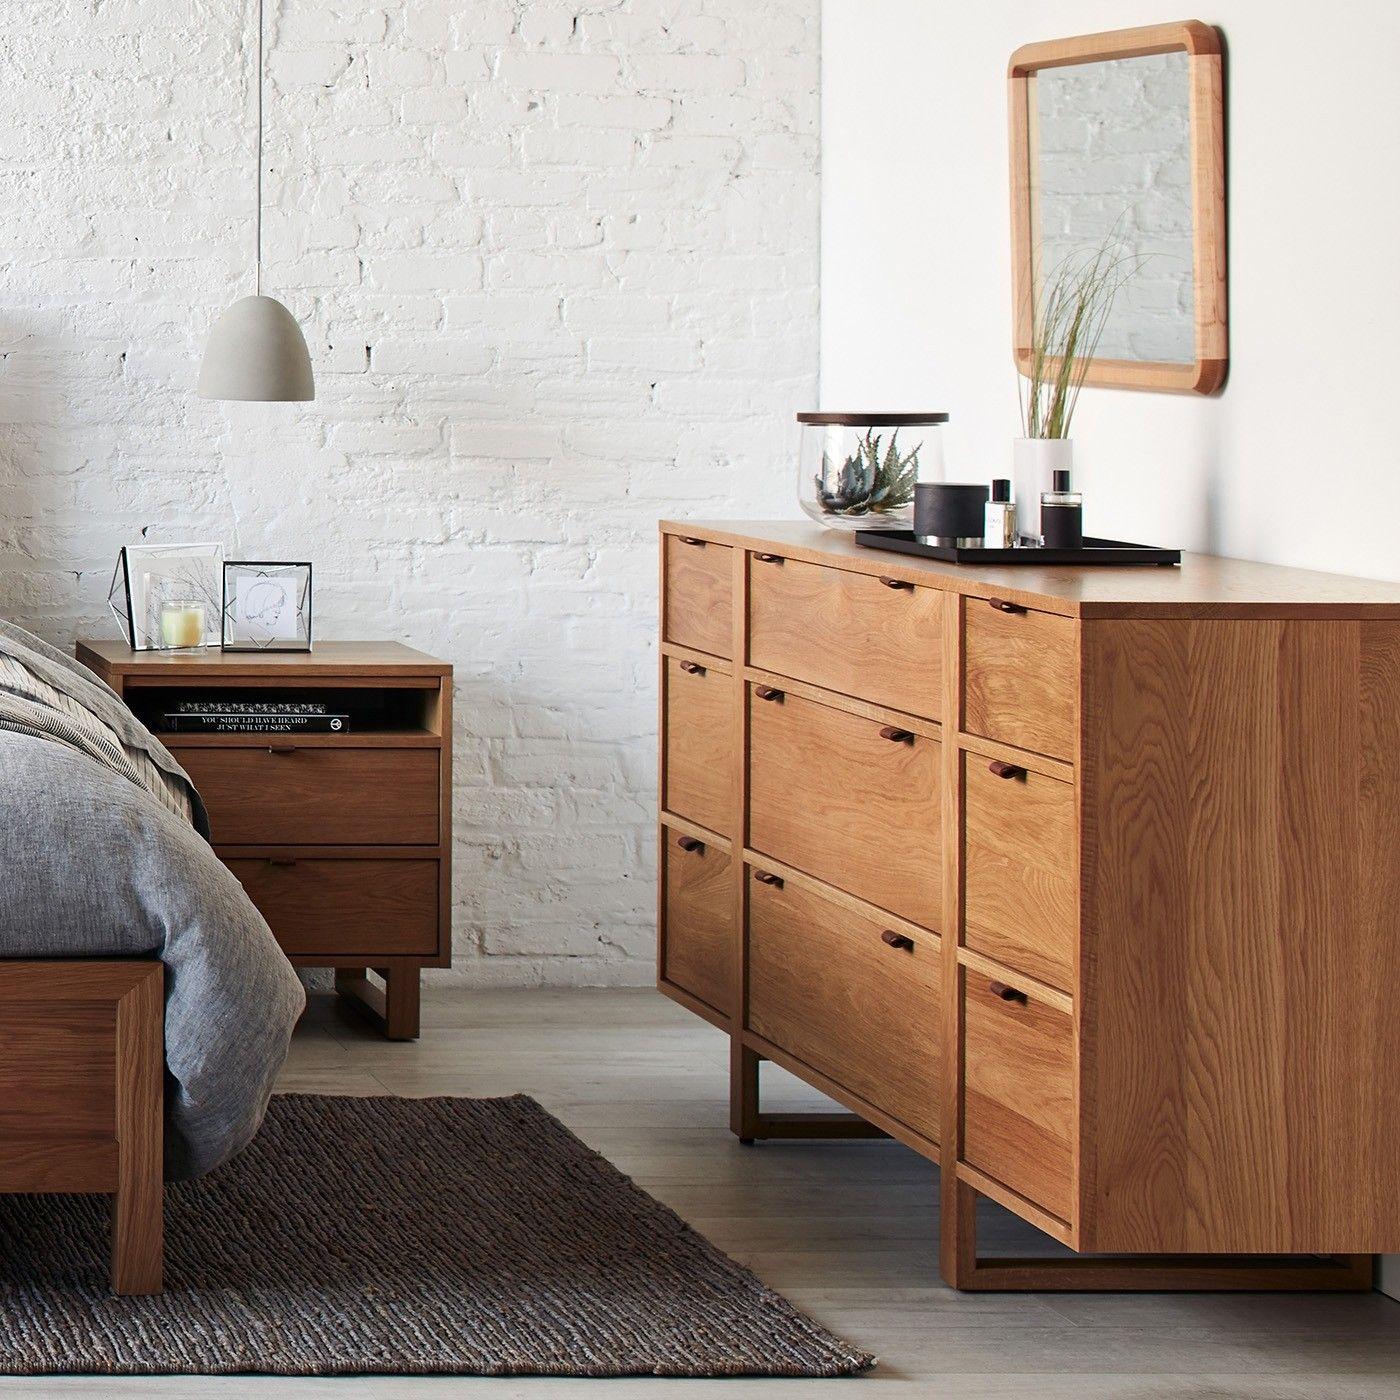 Fulton 9 Drawer Dresser 9 Drawer Dresser Dresser Drawers Bedroom Collections Furniture [ 1400 x 1400 Pixel ]